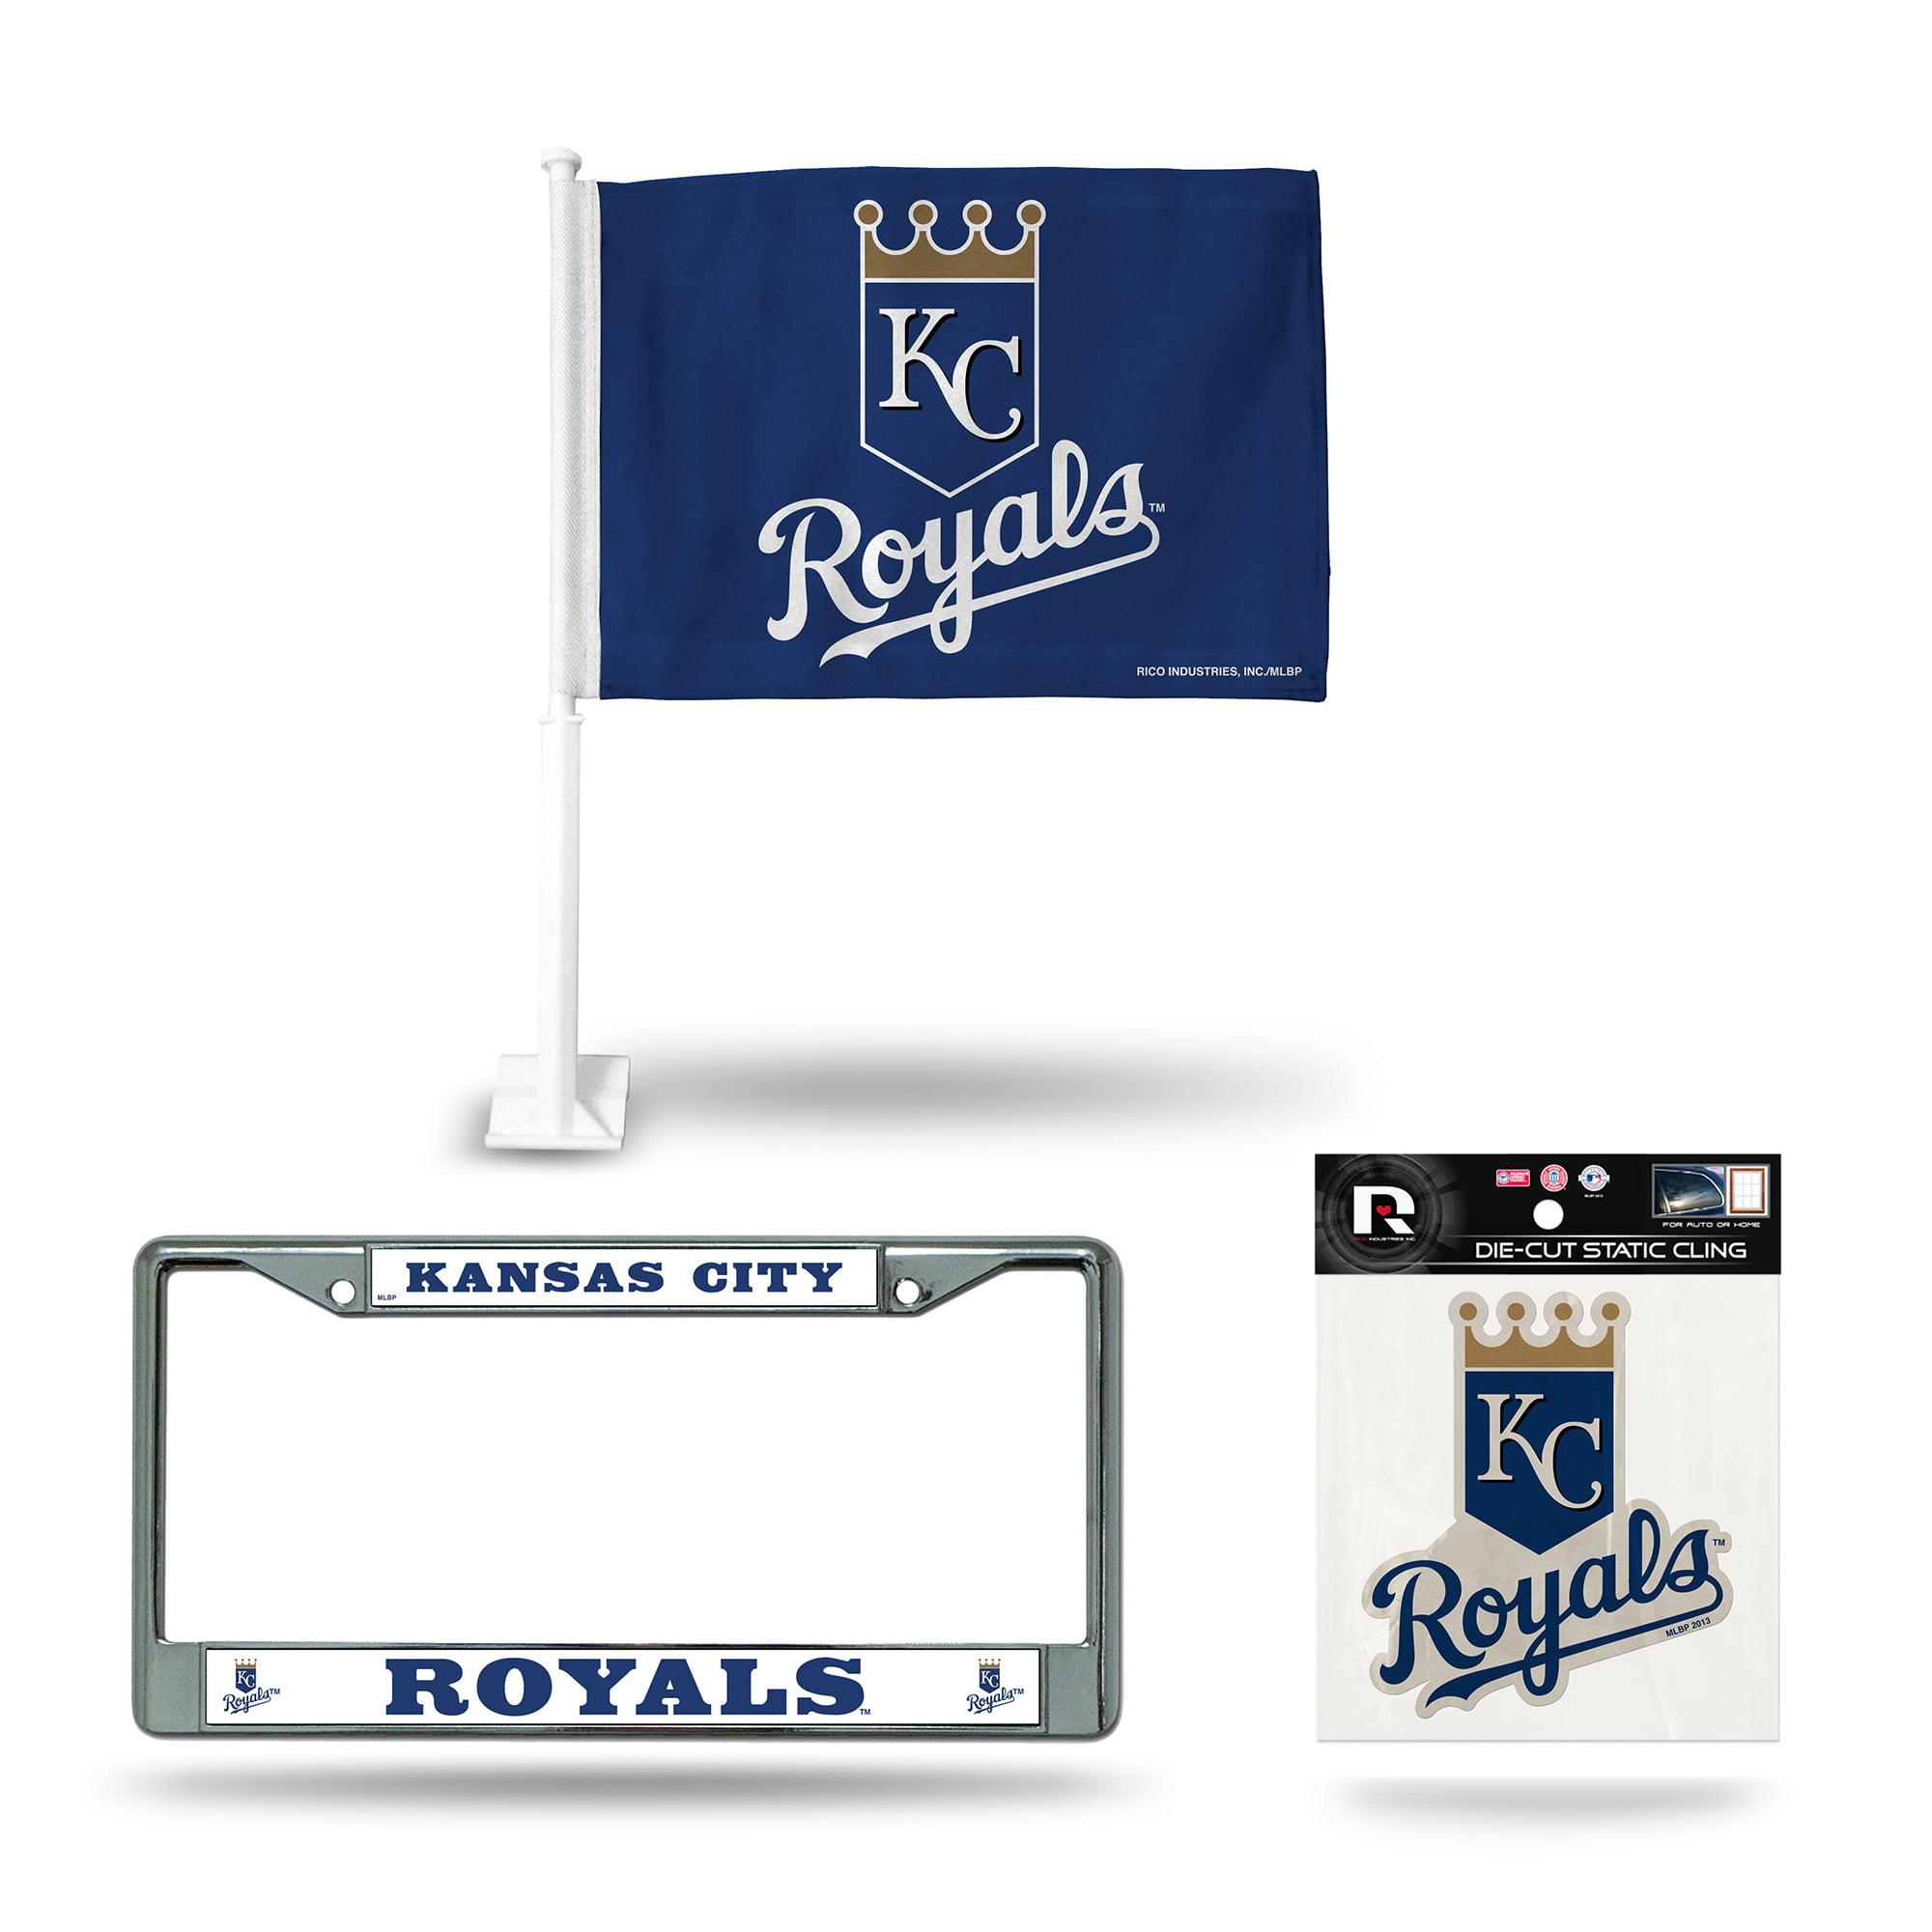 Kansas City Royals Sparo Auto Pack - No Size